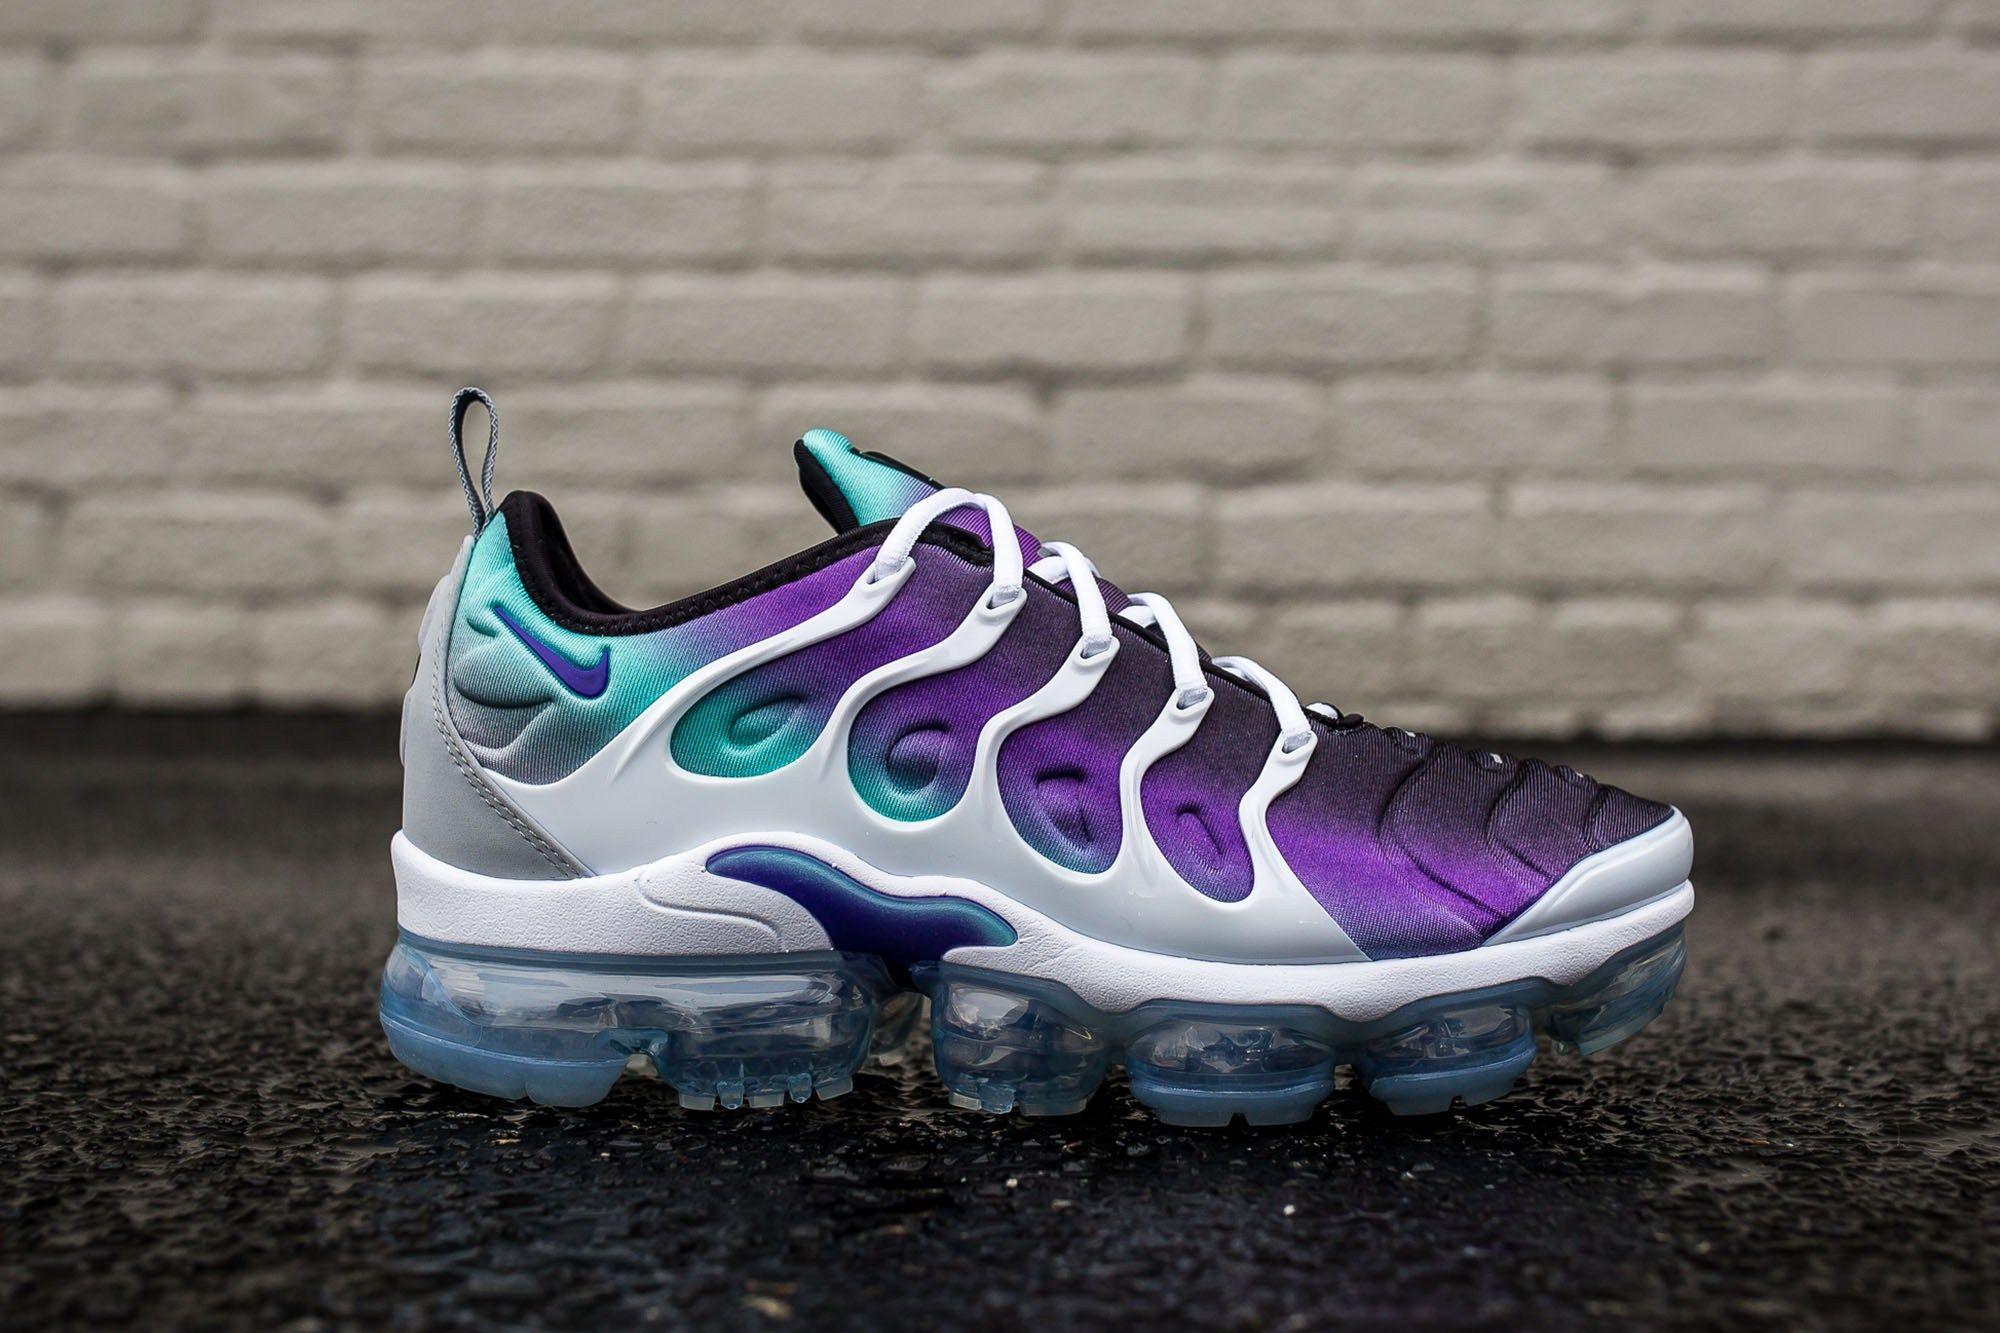 Nike Air Vapormax Plus Grape Kicks Shoes Exclusive Shoes Sneaker Magazine